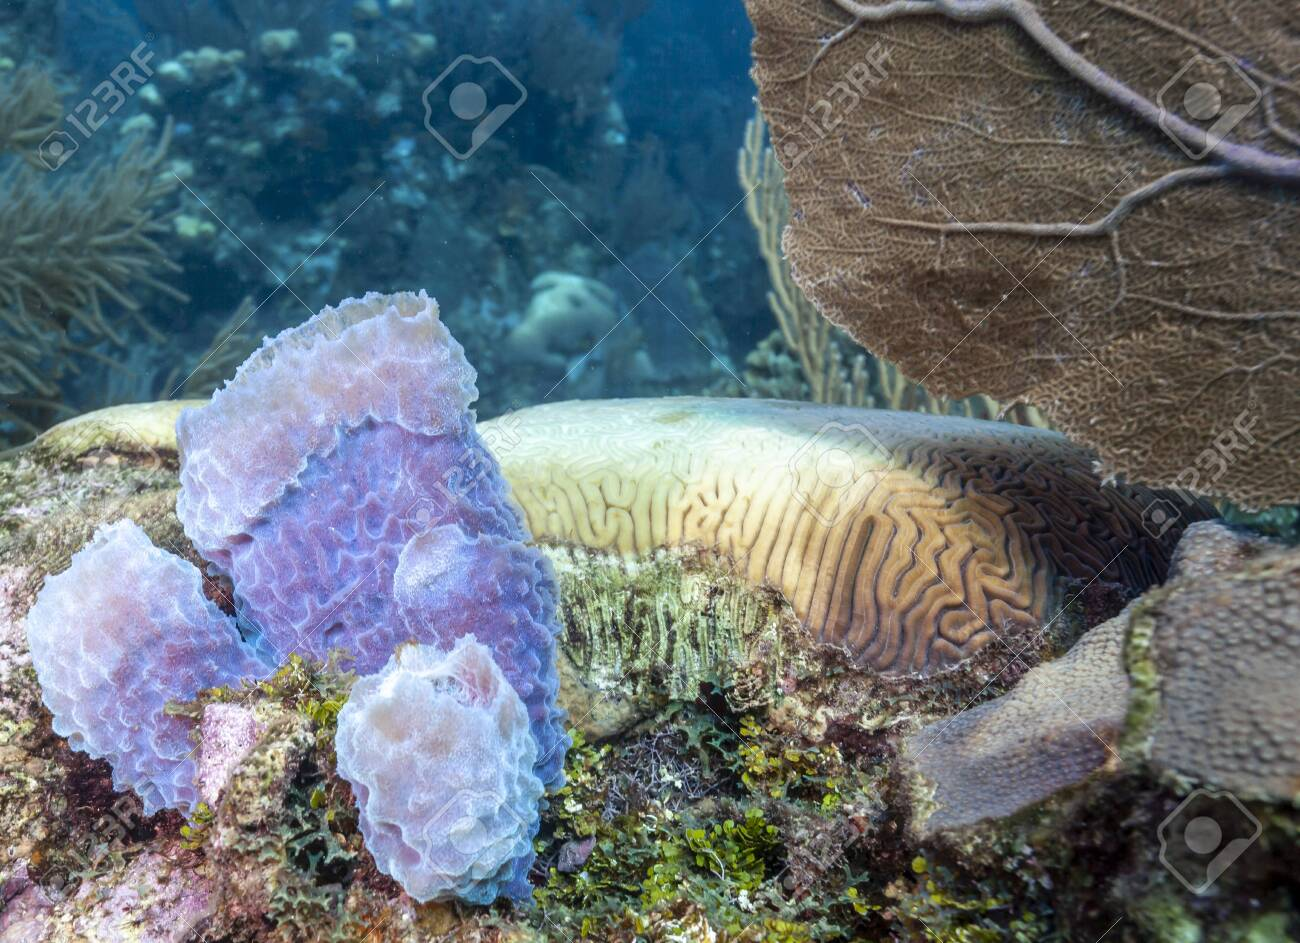 Coral garden in Caribbean off the coast of the island of Raotan - 124540671